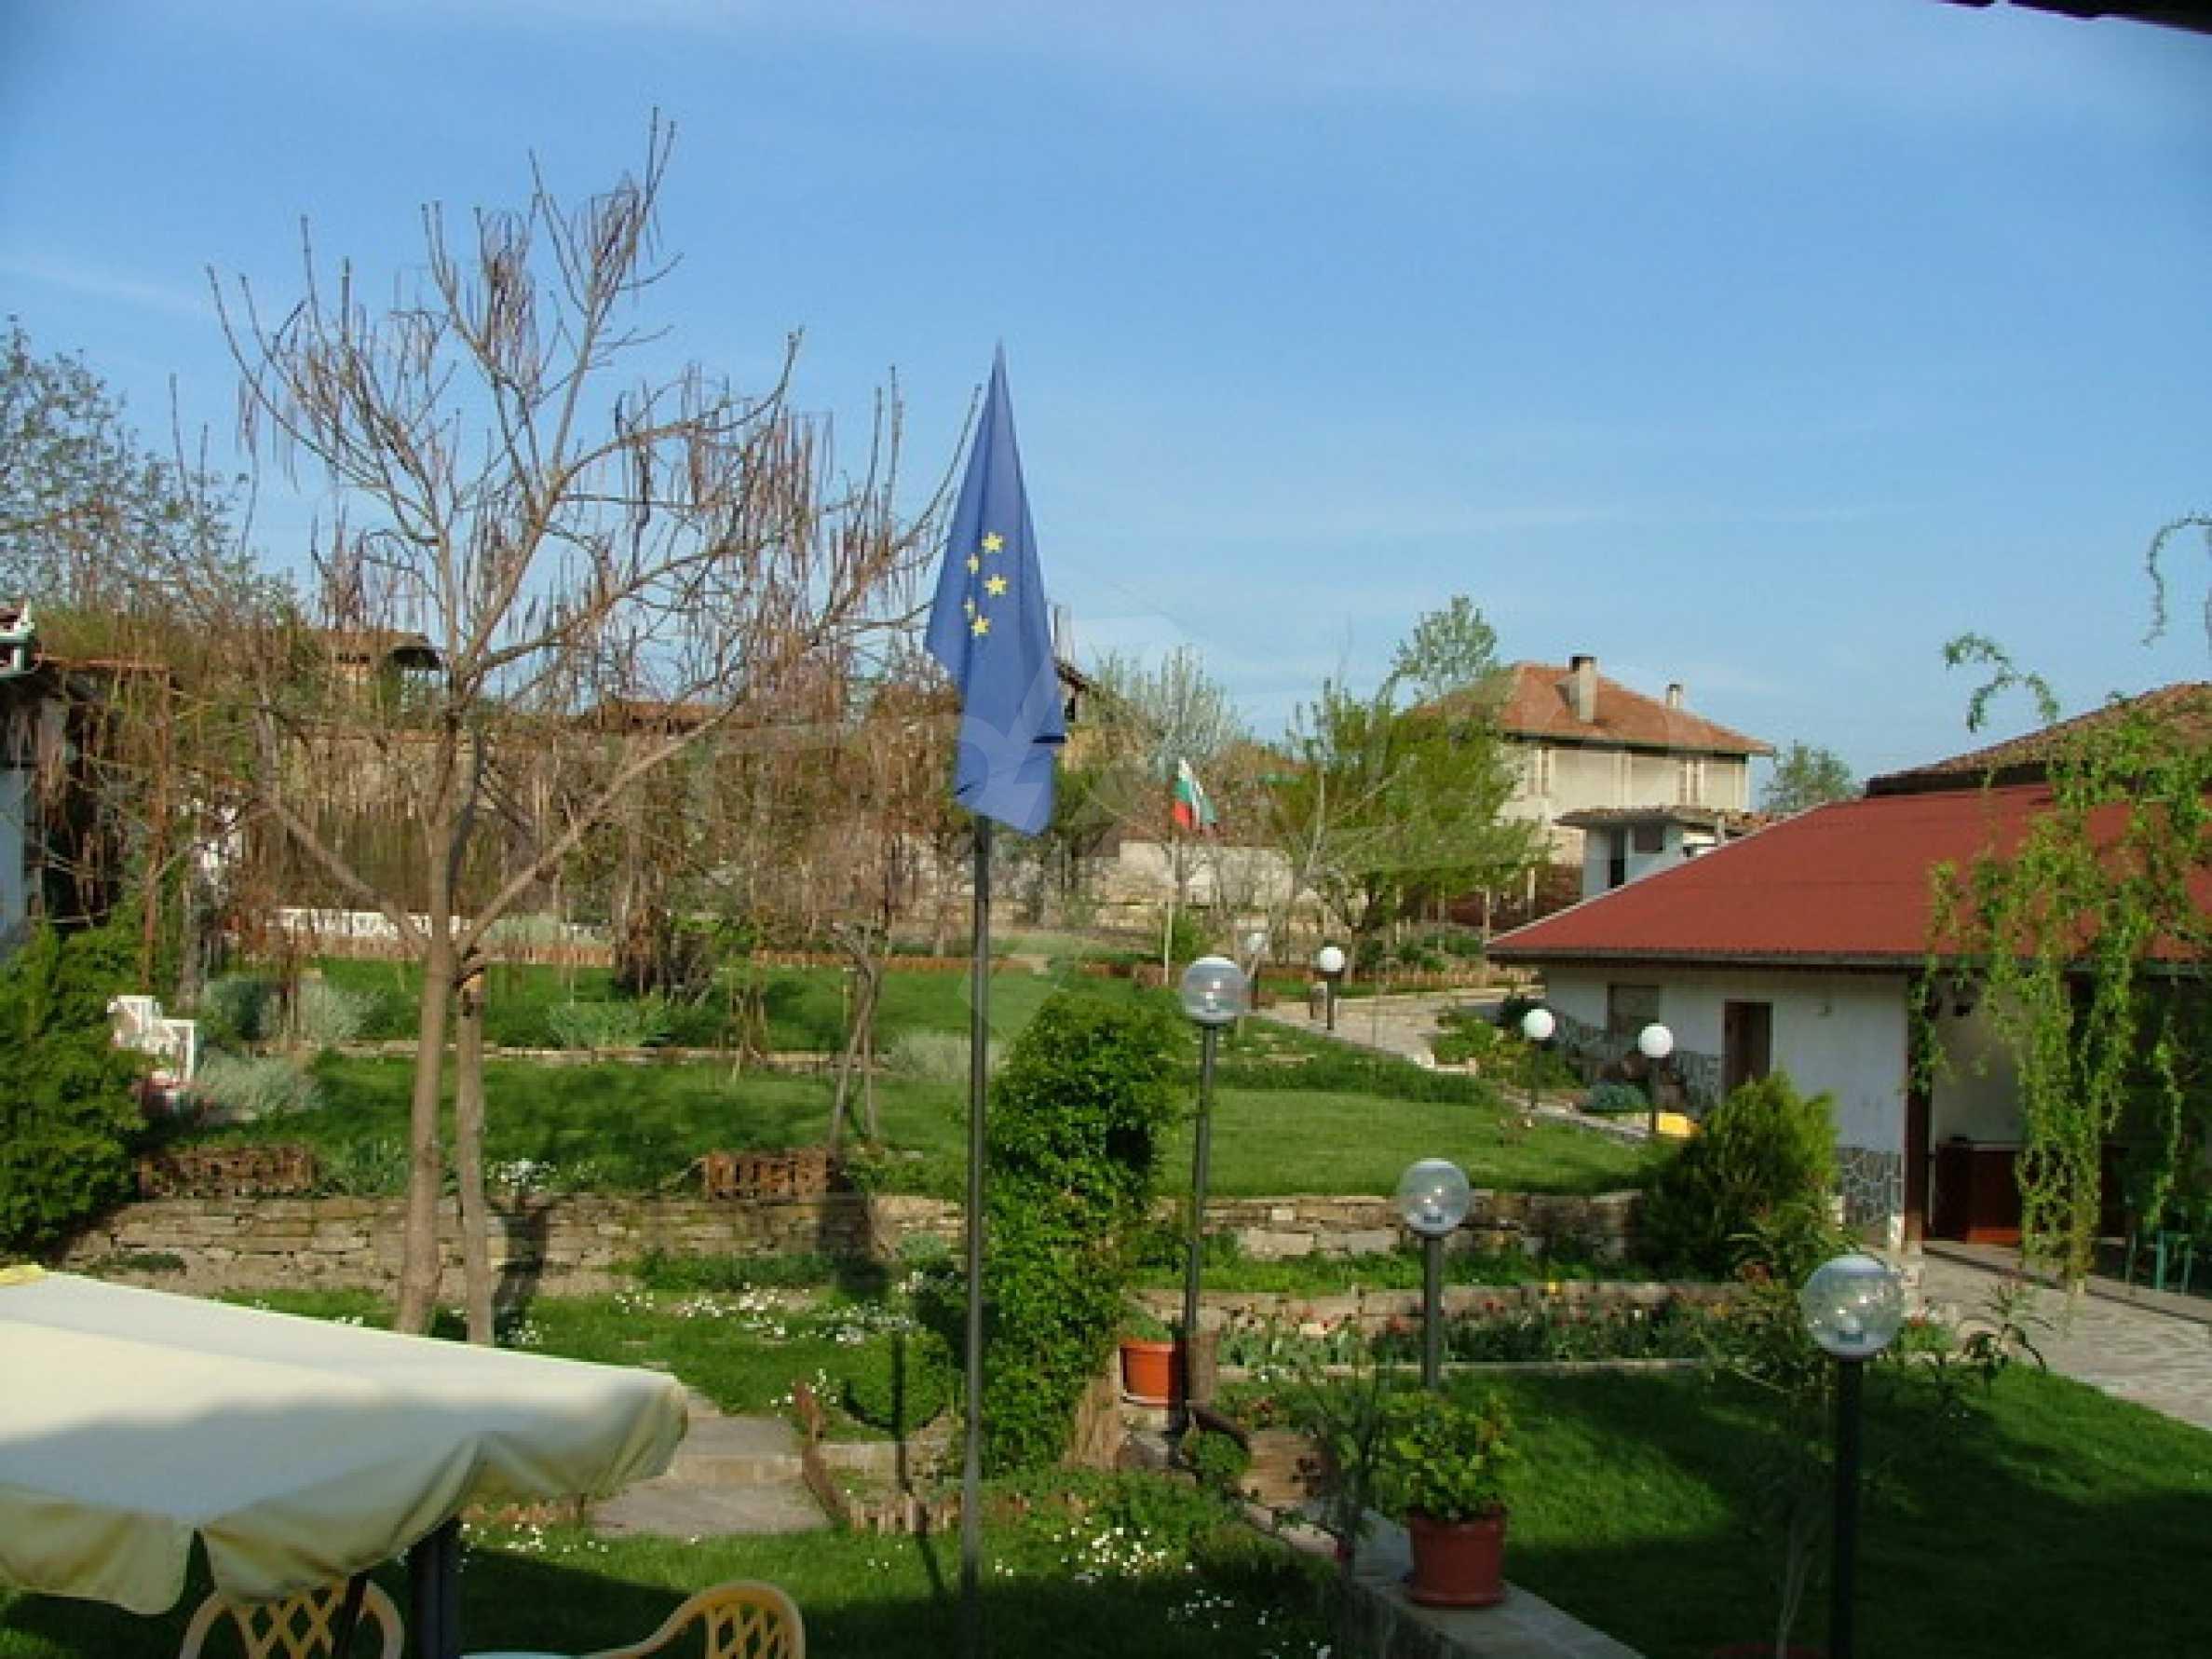 Stilvoll renovierte Villa 12 km entfernt. von Veliko Tarnovo 35